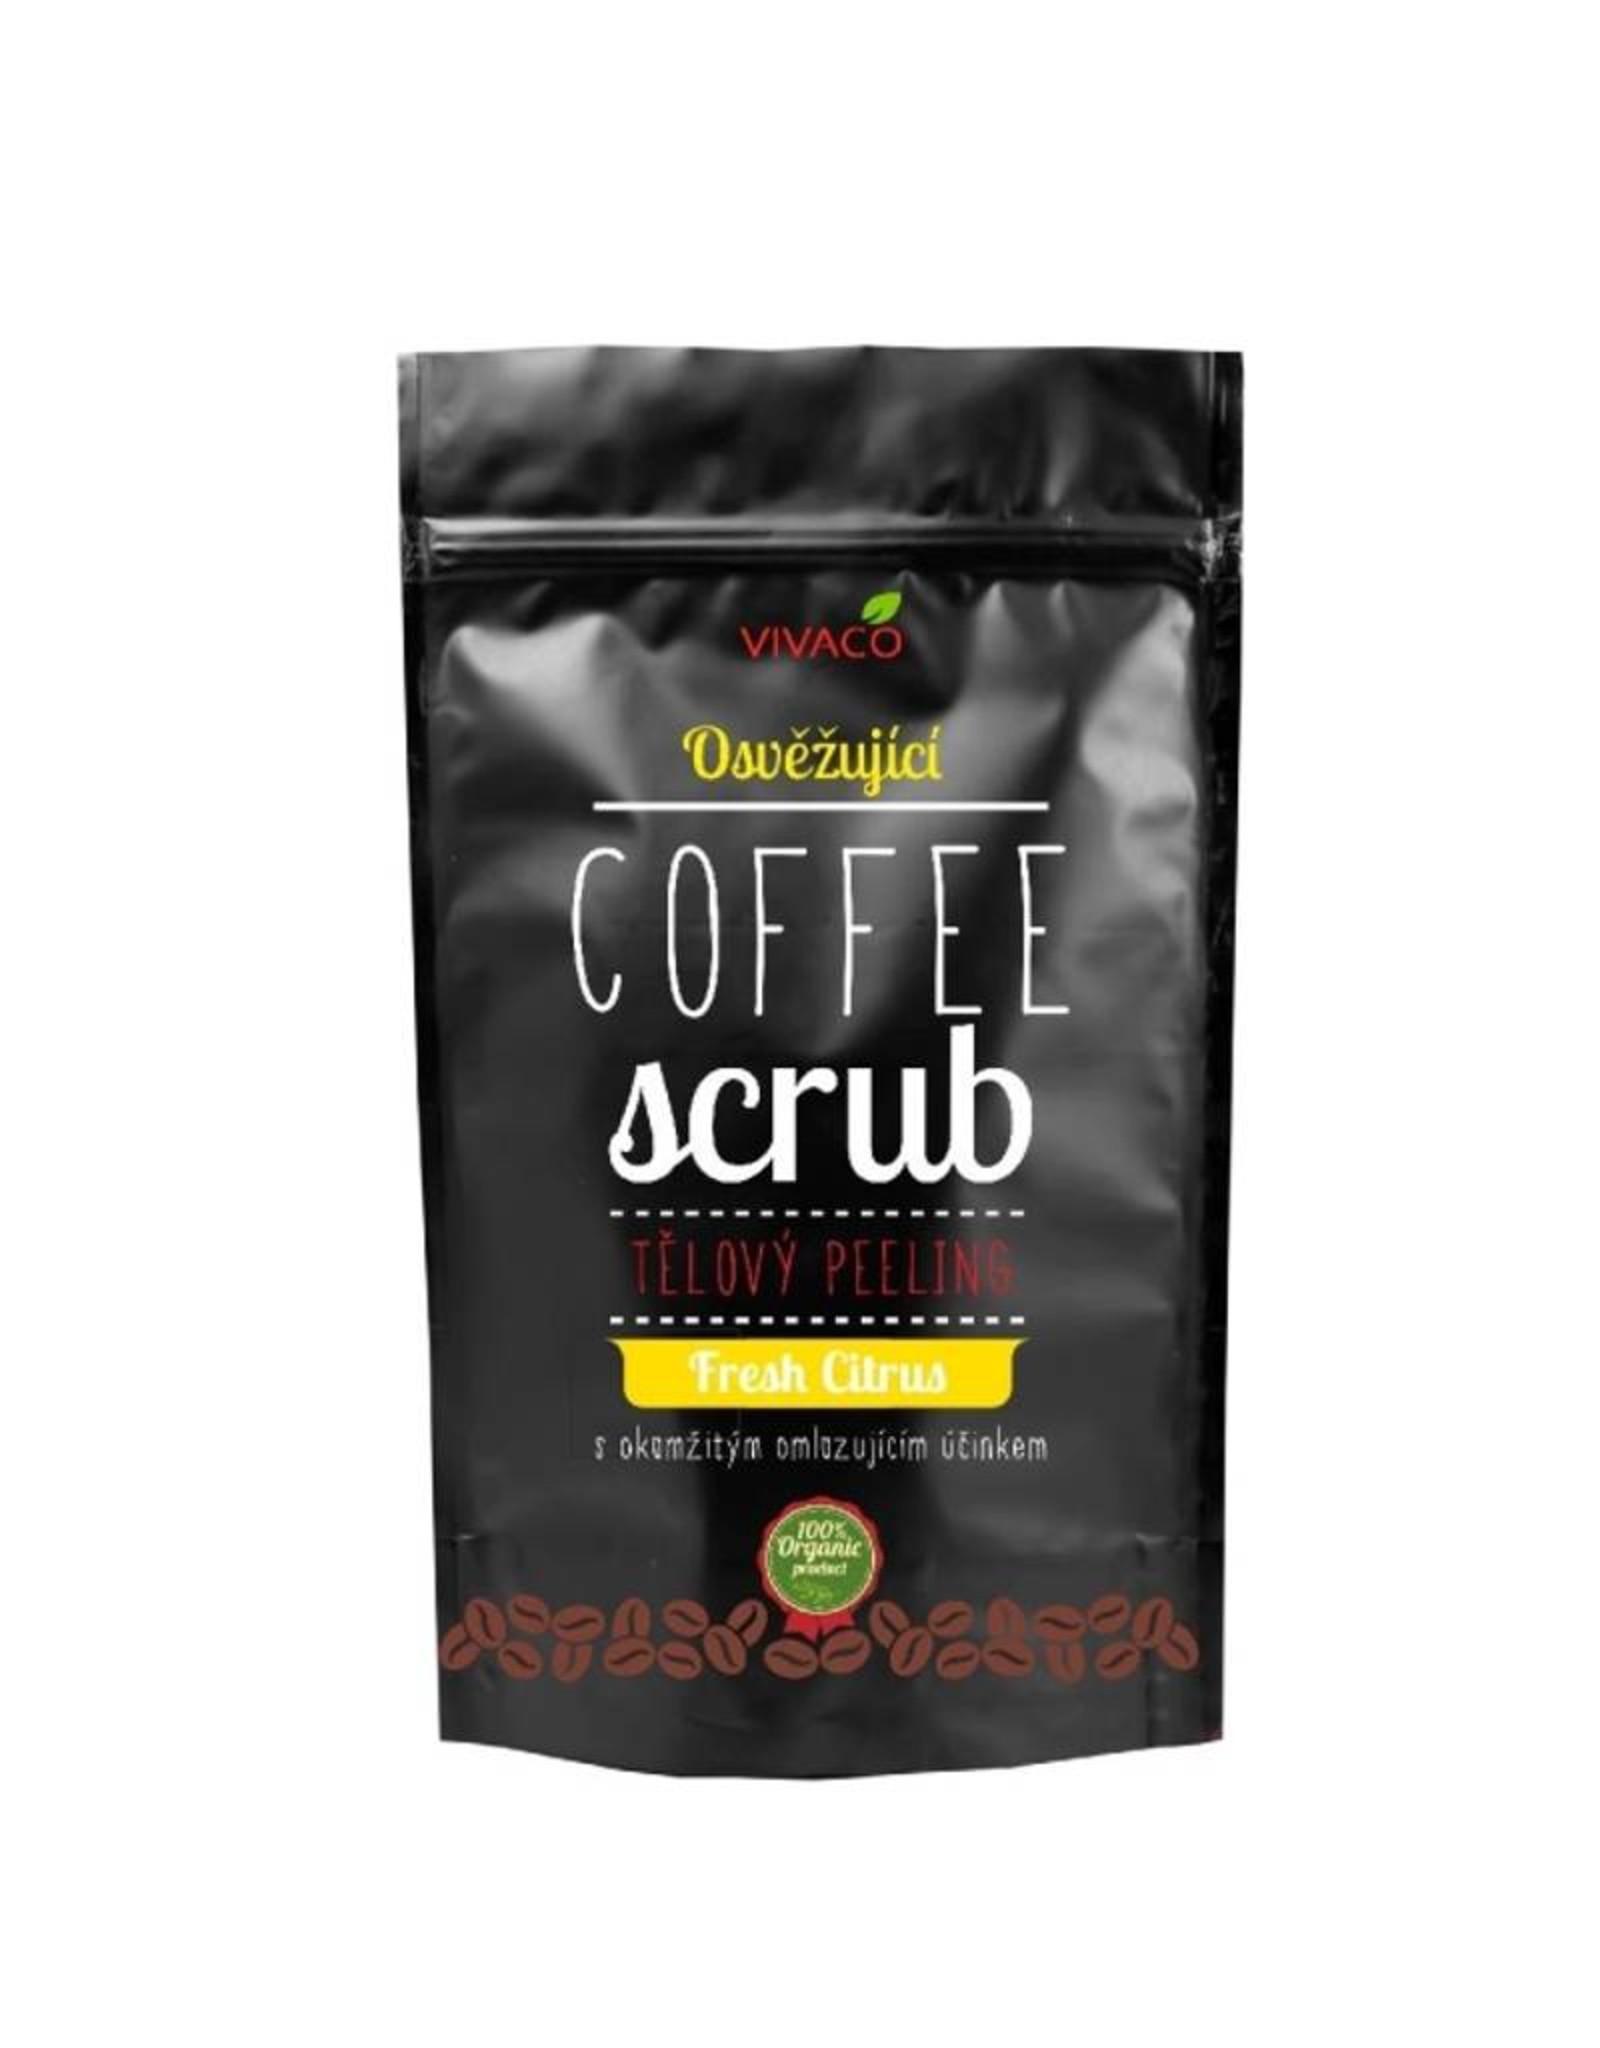 VIVACO Coffee Scrub Body Peeling Fresh Citrus (100% organisch)